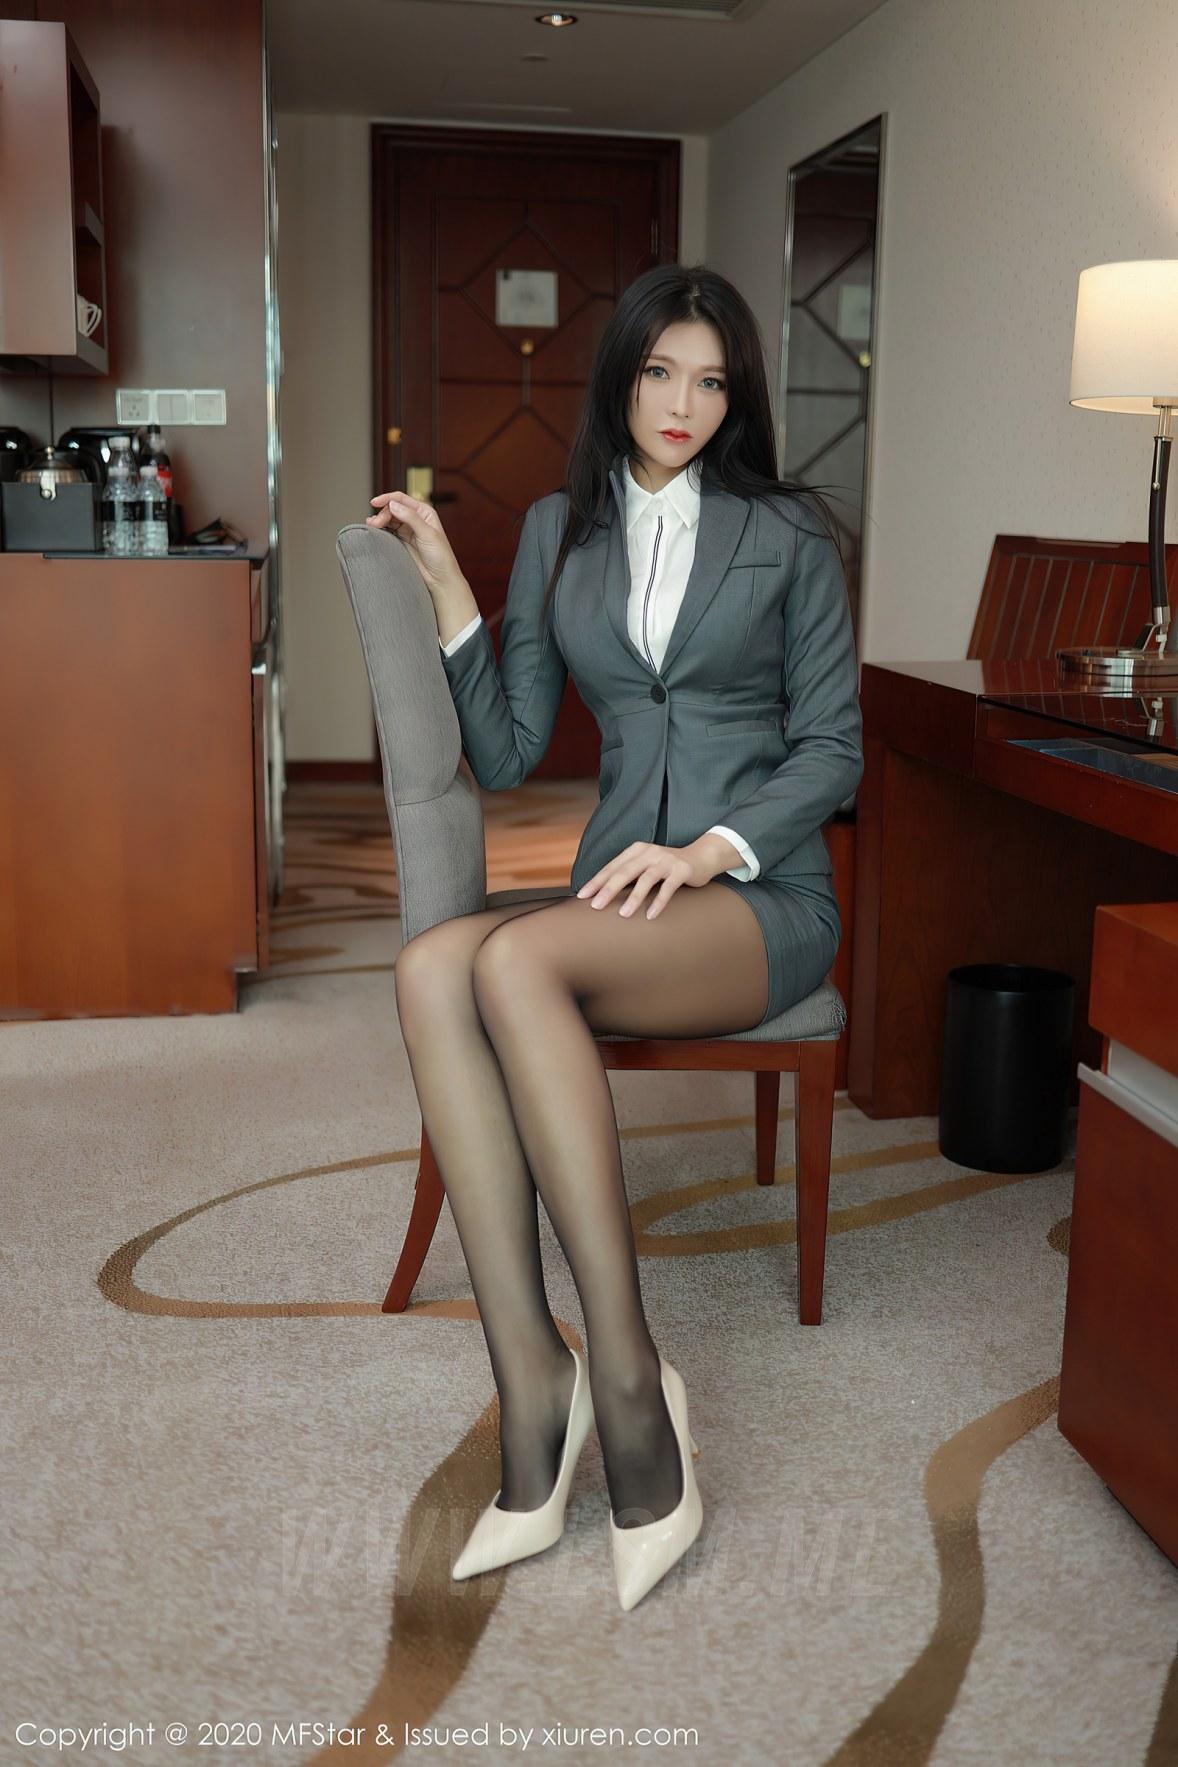 MFStar 模范学院 Vol.426  性感短裙爆乳 娜比 - 2